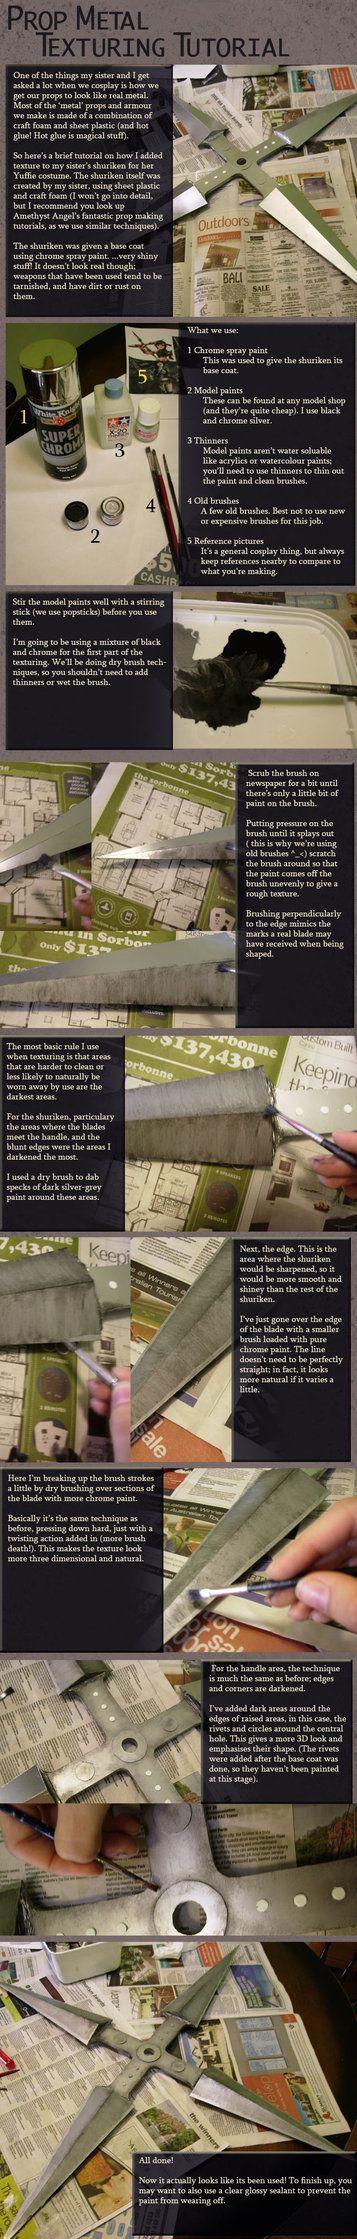 Cosplay:Metal Texture Tutorial by Risachantag on DeviantArt